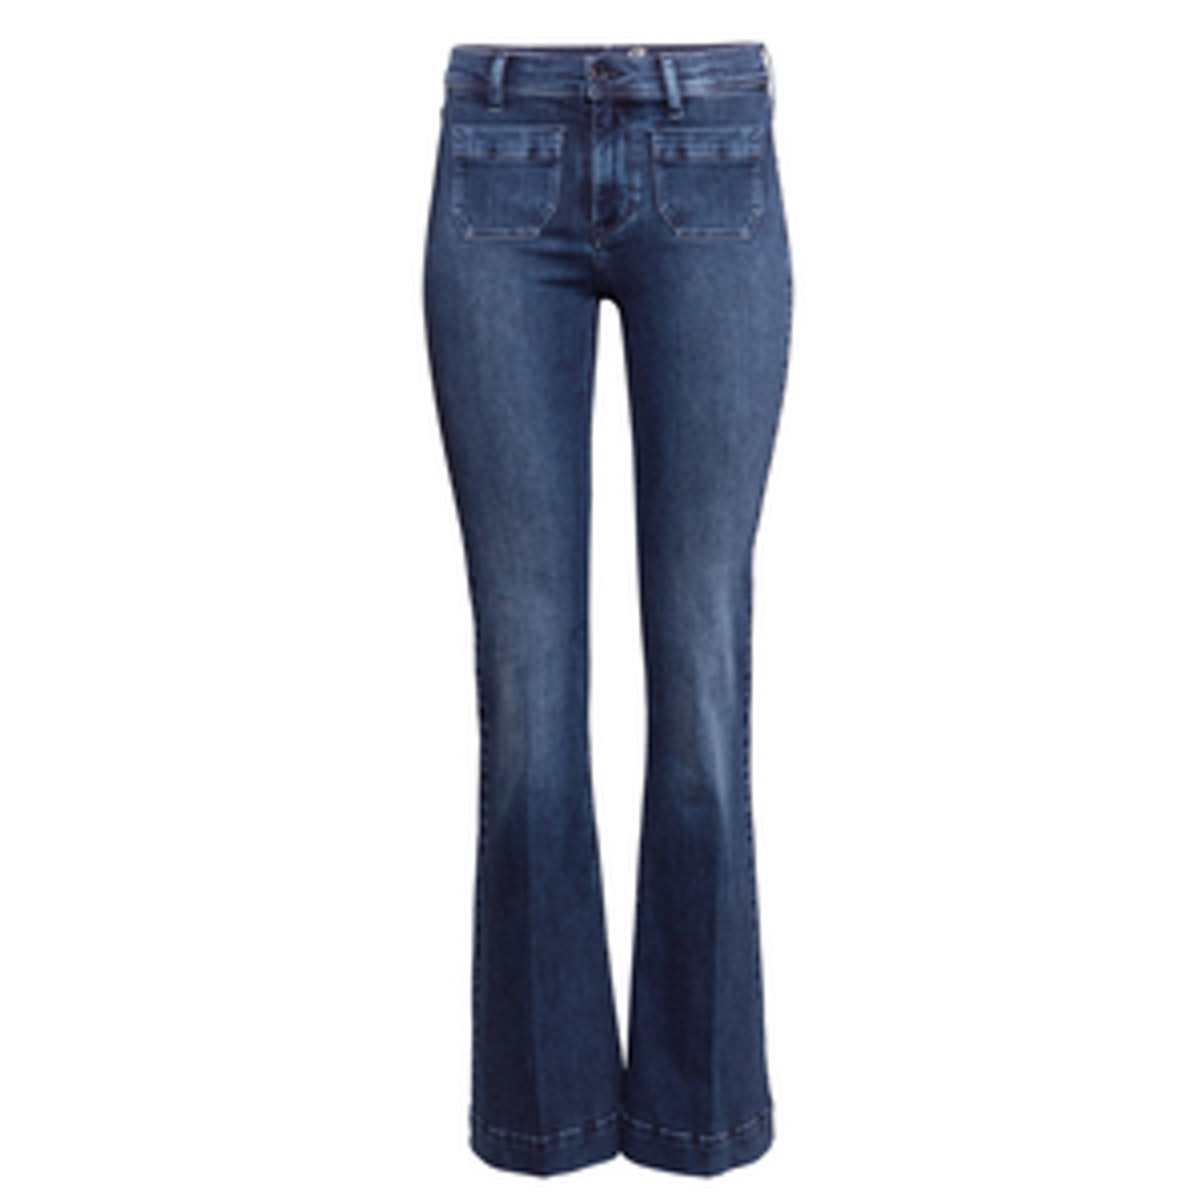 Shaping Flare Regular Jeans